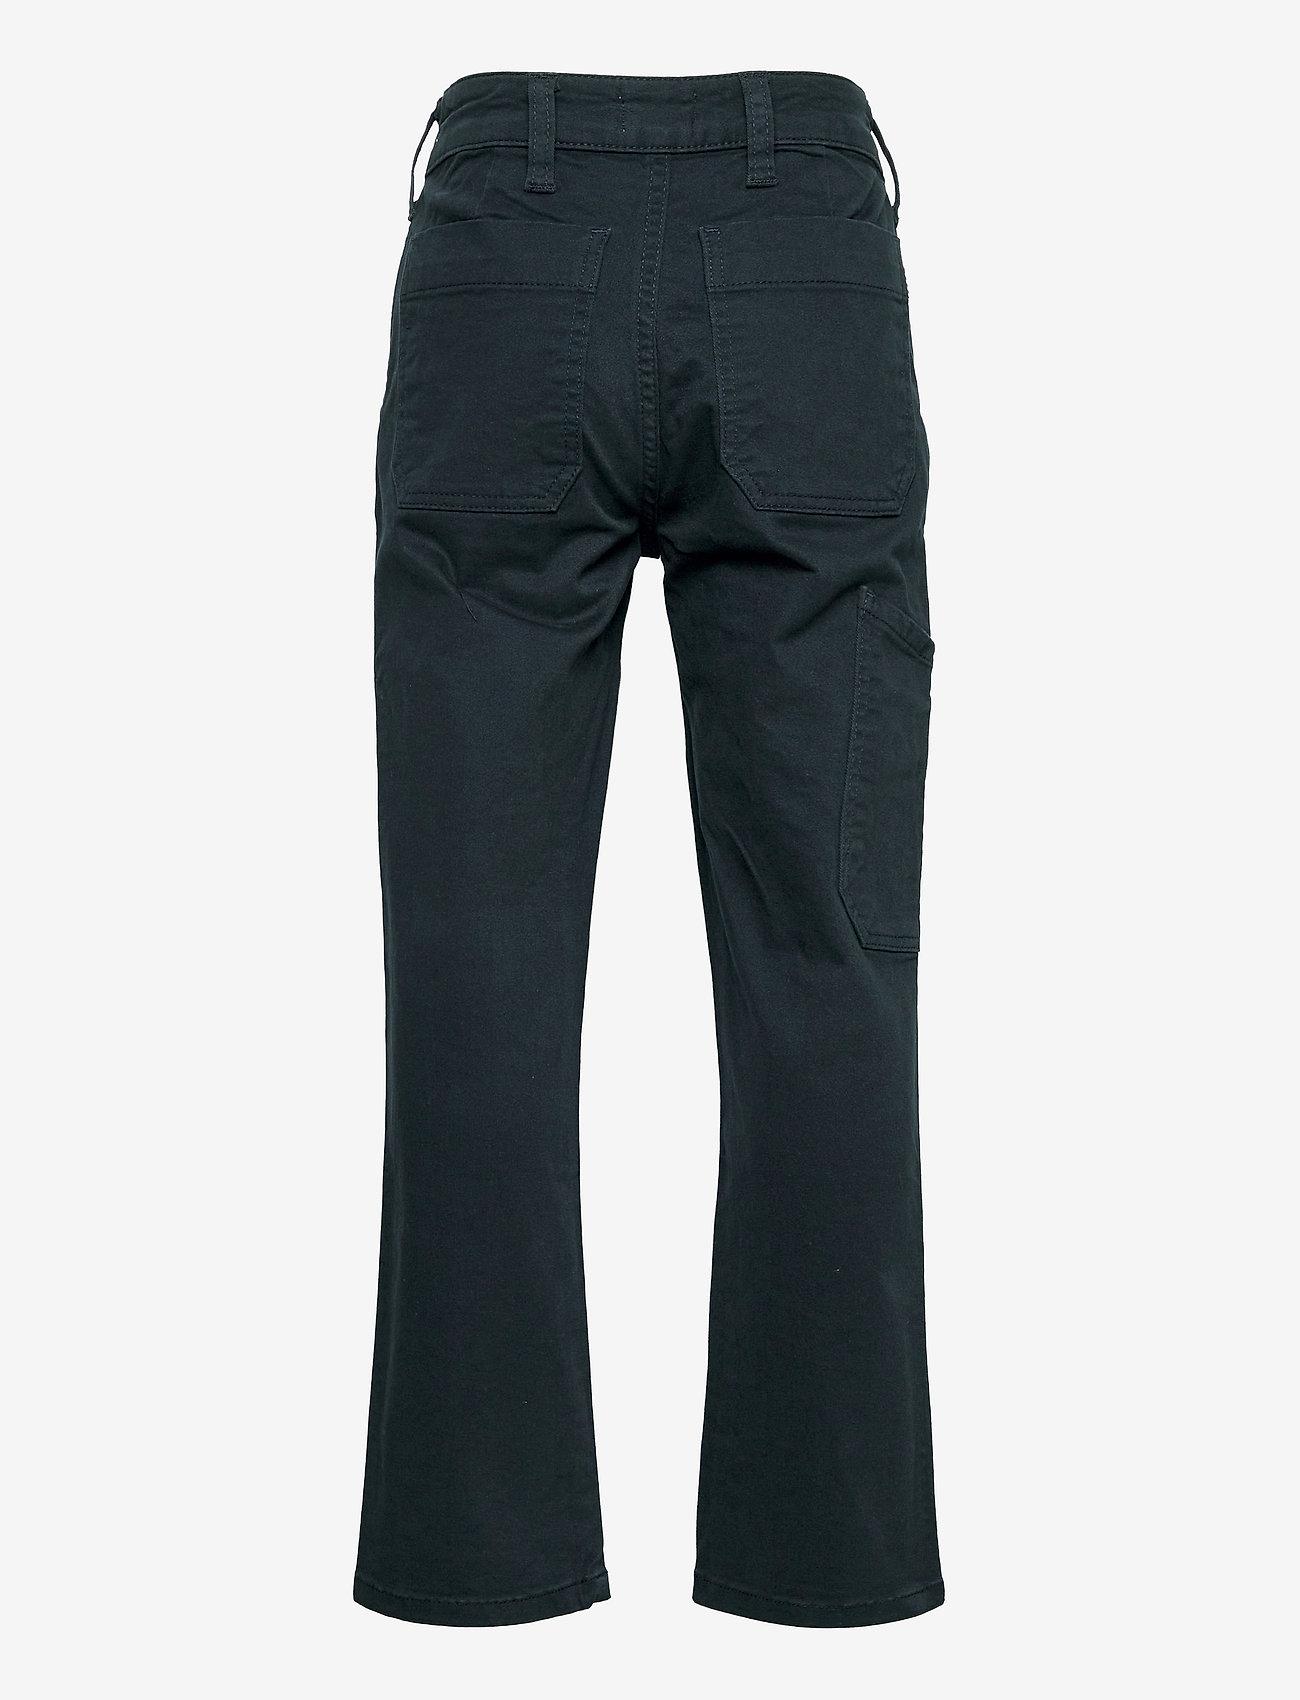 Mads Nørgaard - Comfort Pasino - trousers - sky captain - 1